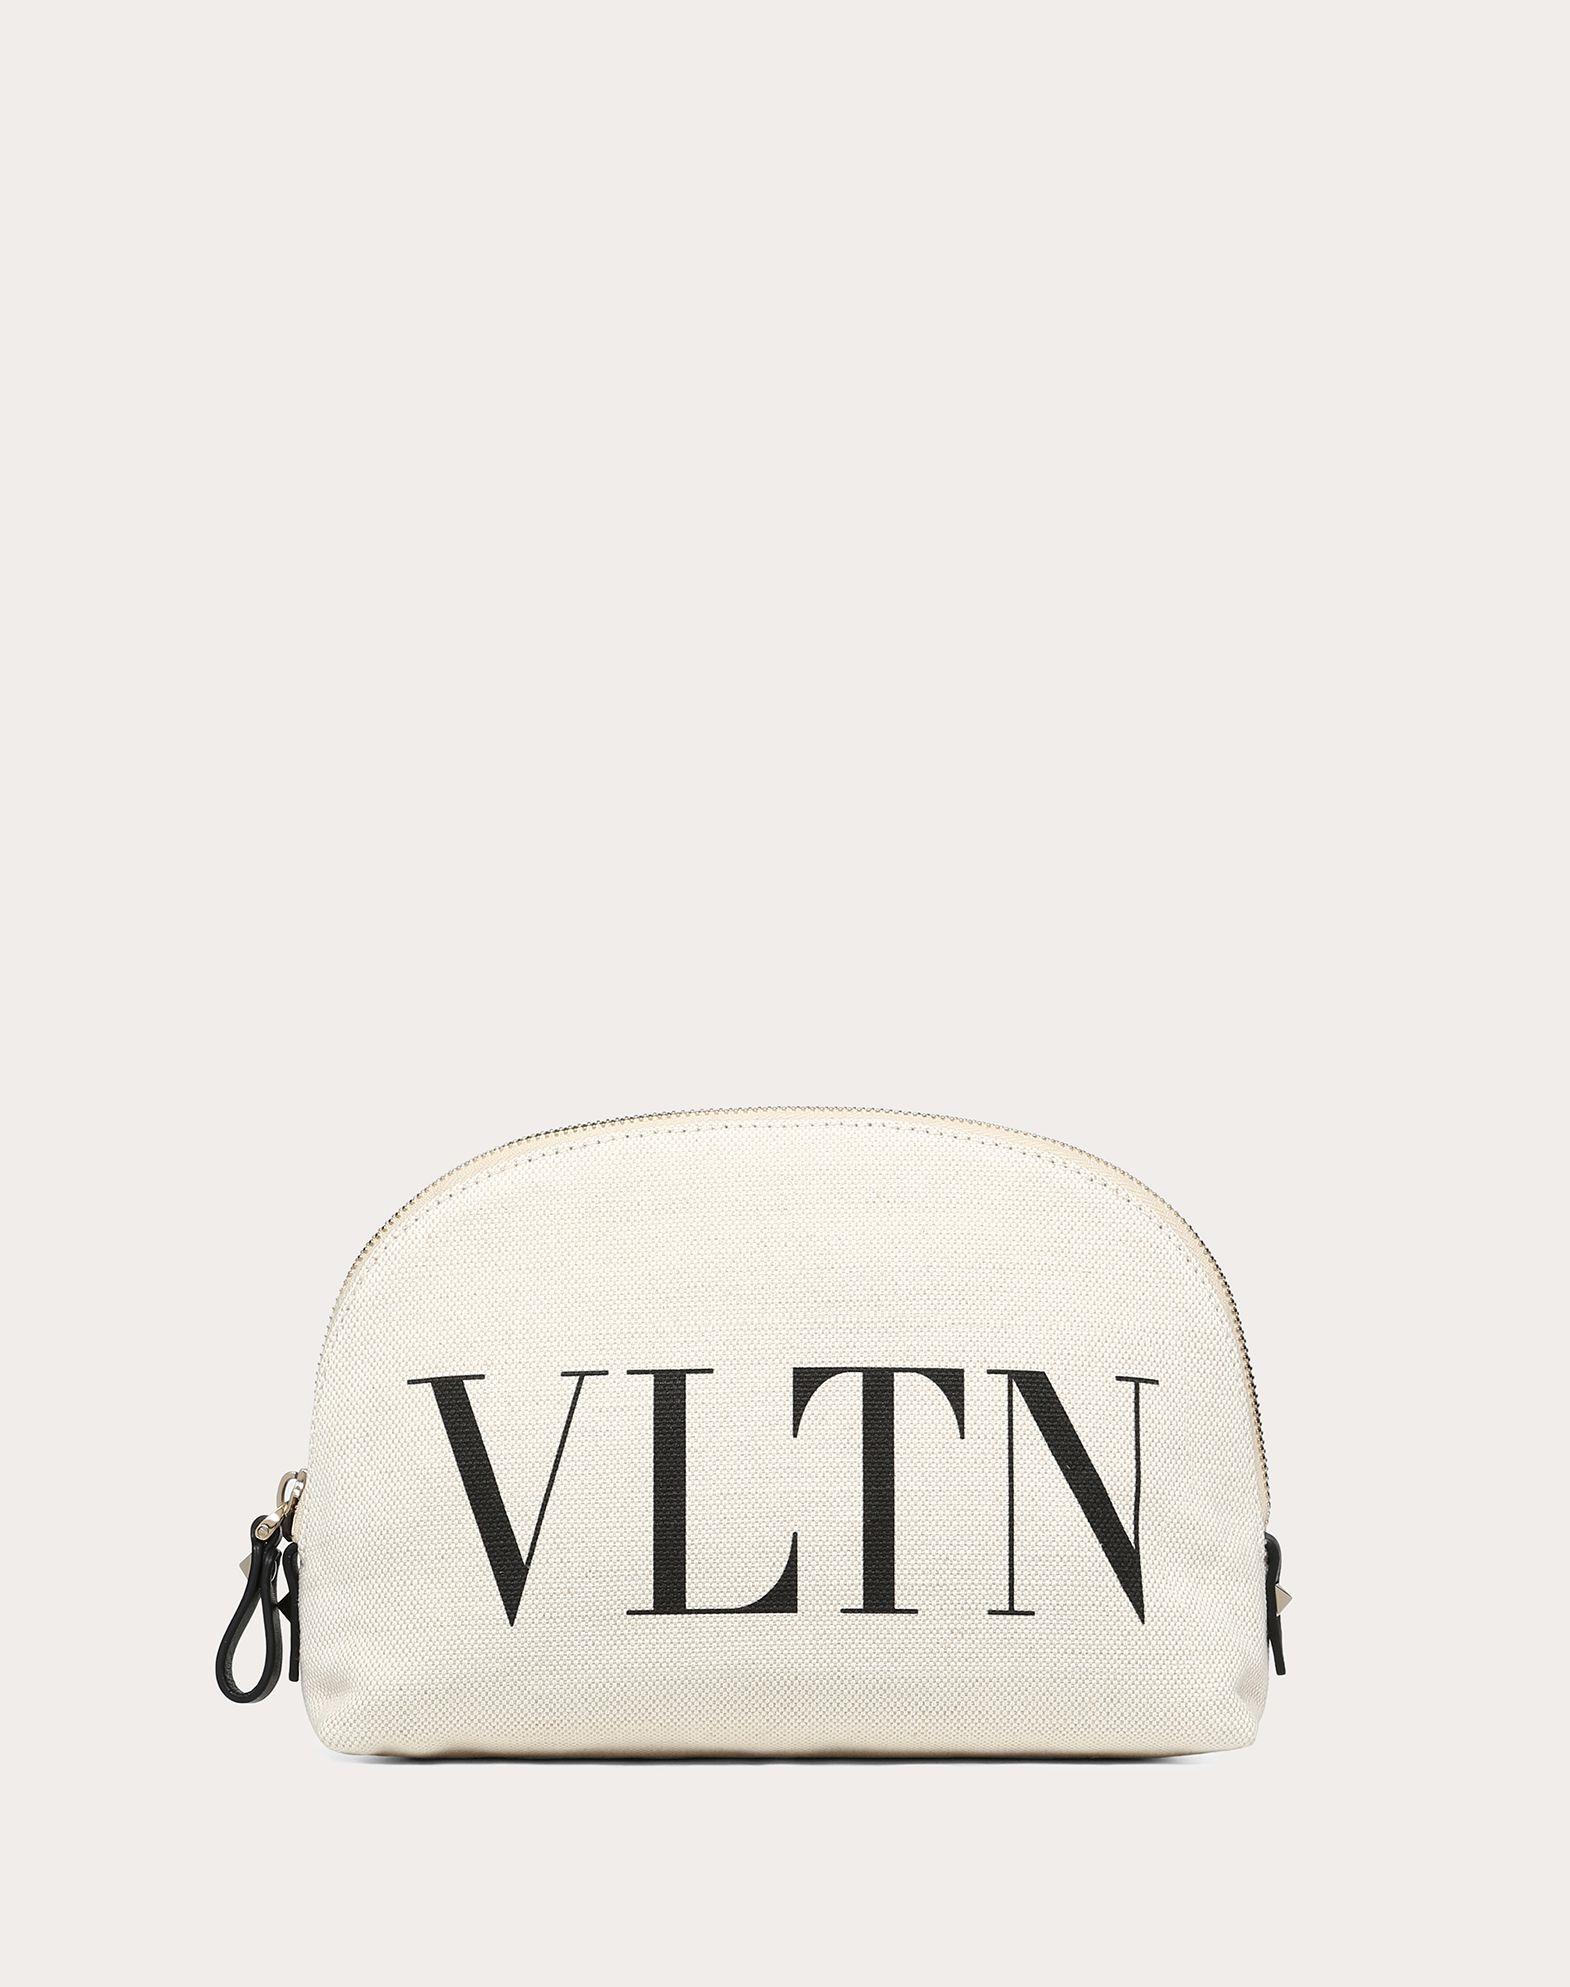 VLTN 化妆包